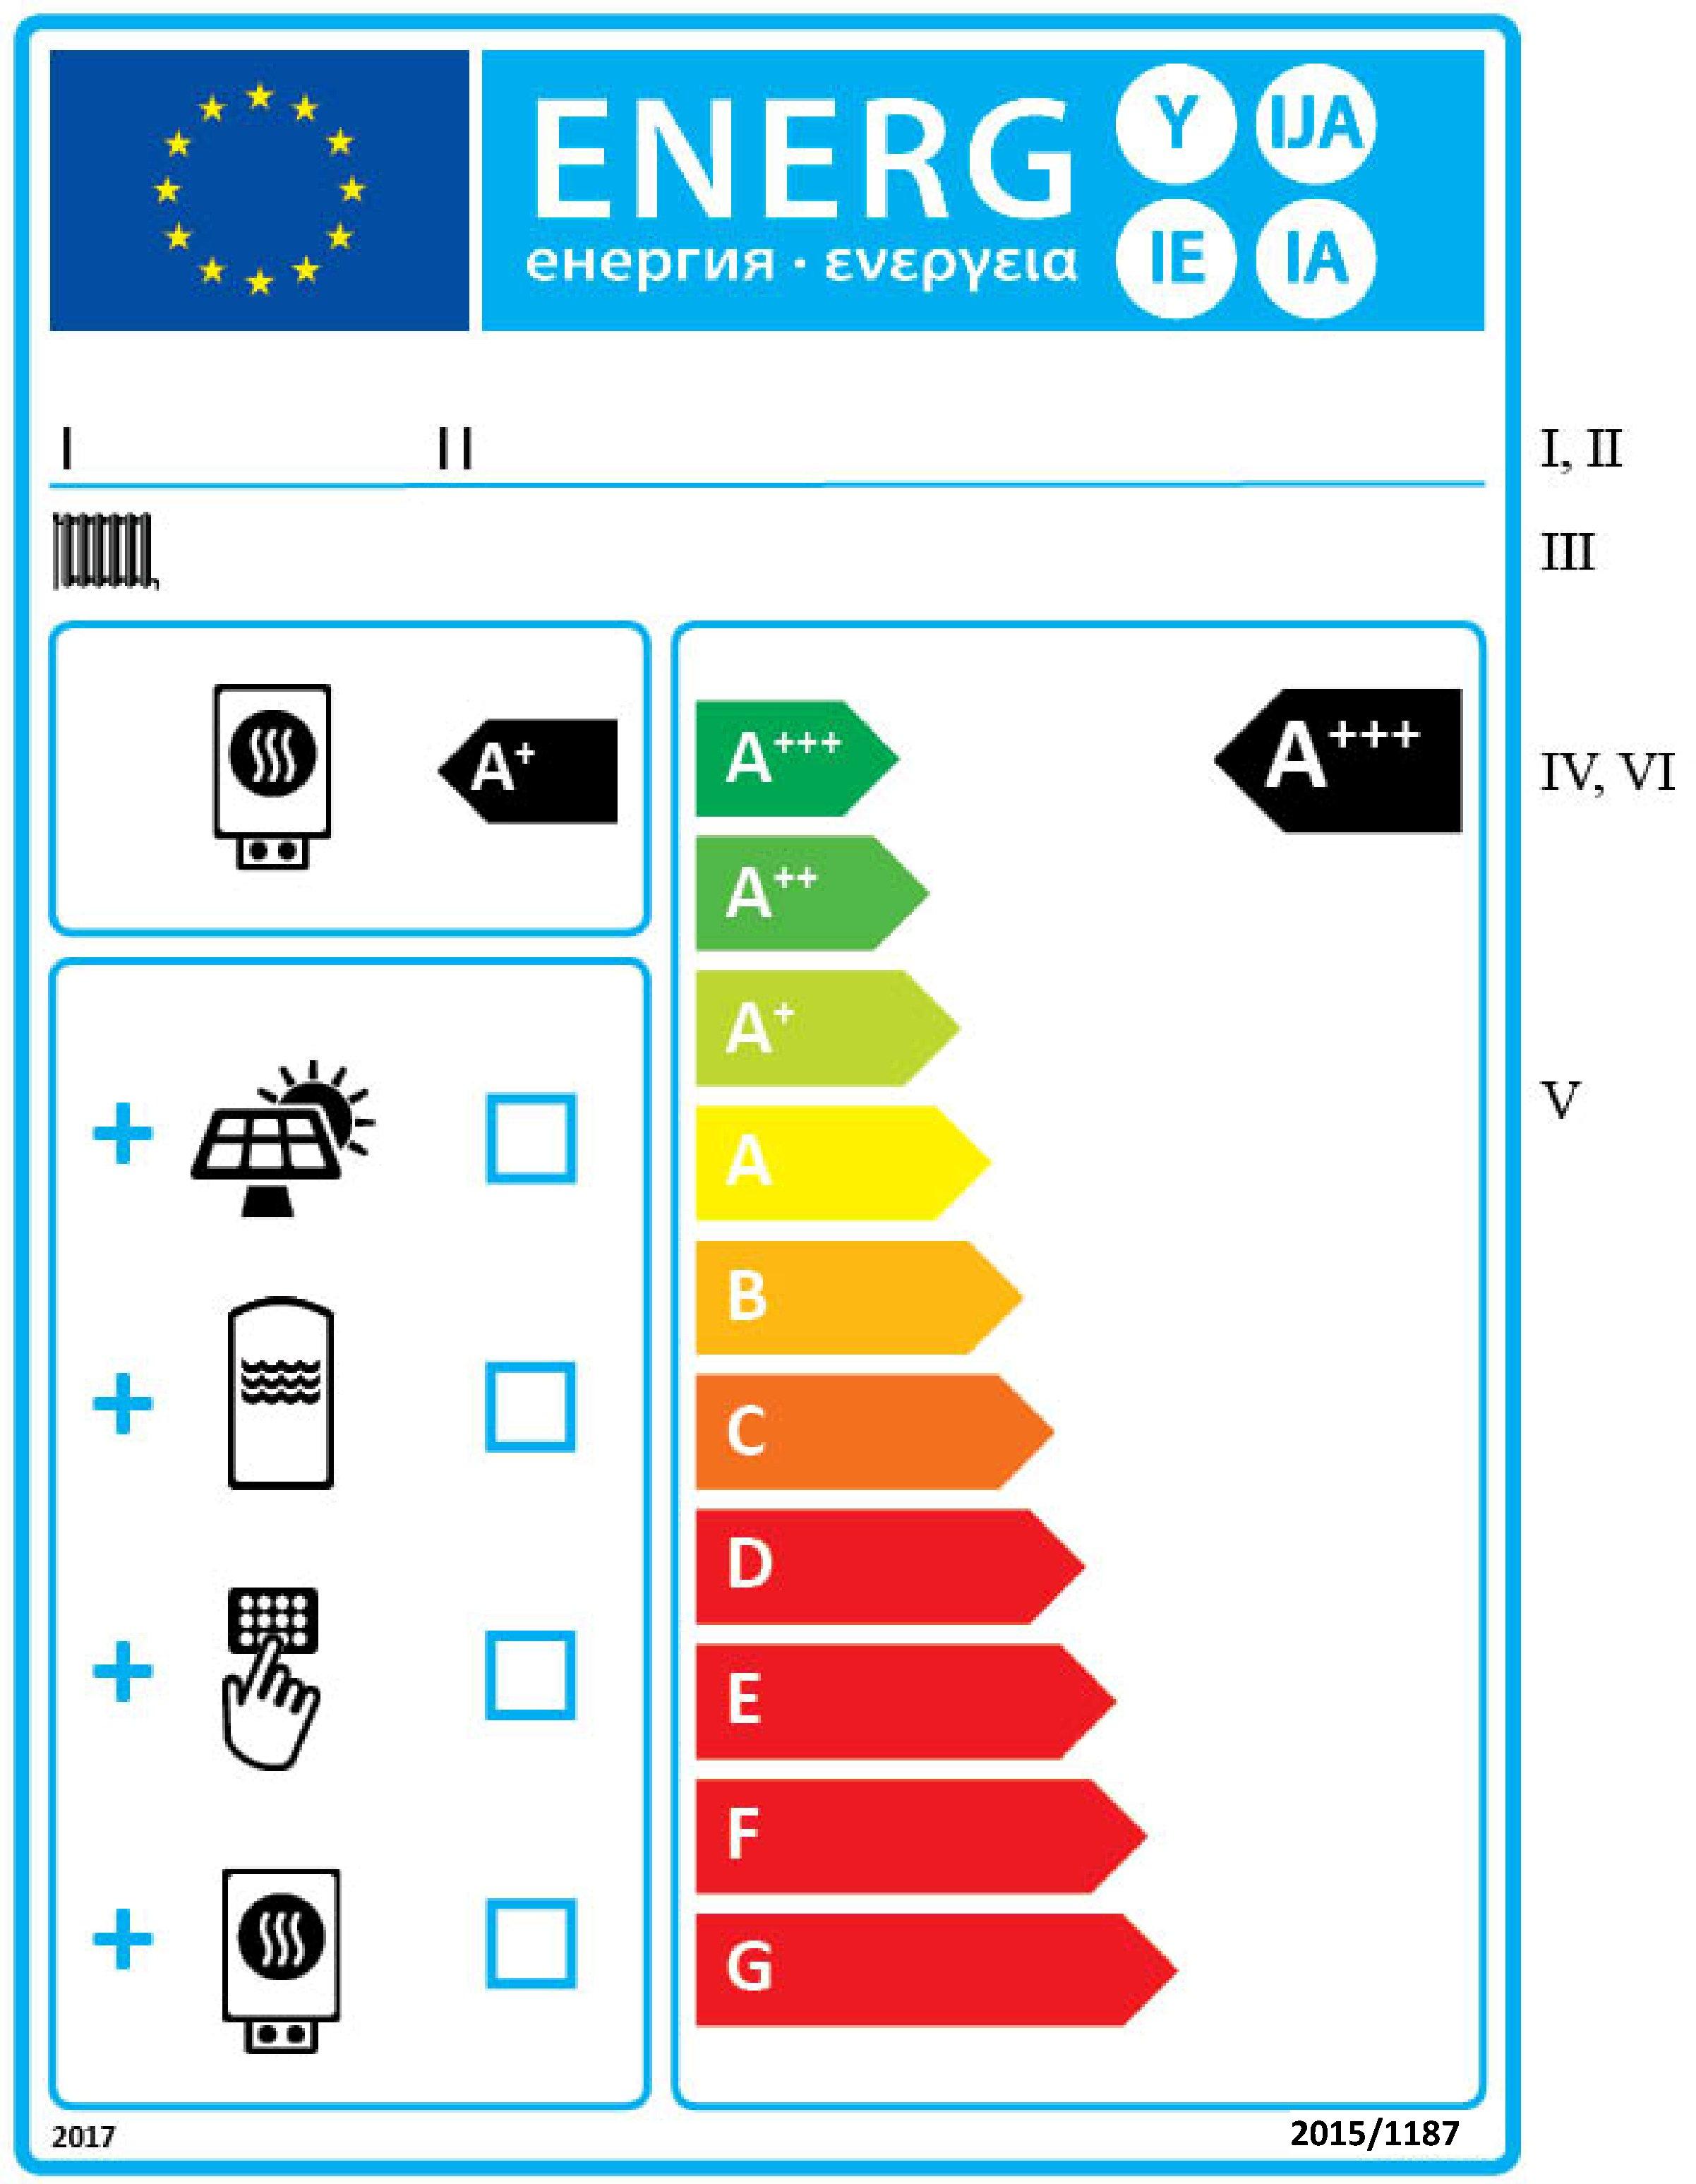 EUR-Lex - 02015R1187-20170307 - EN - EUR-Lex